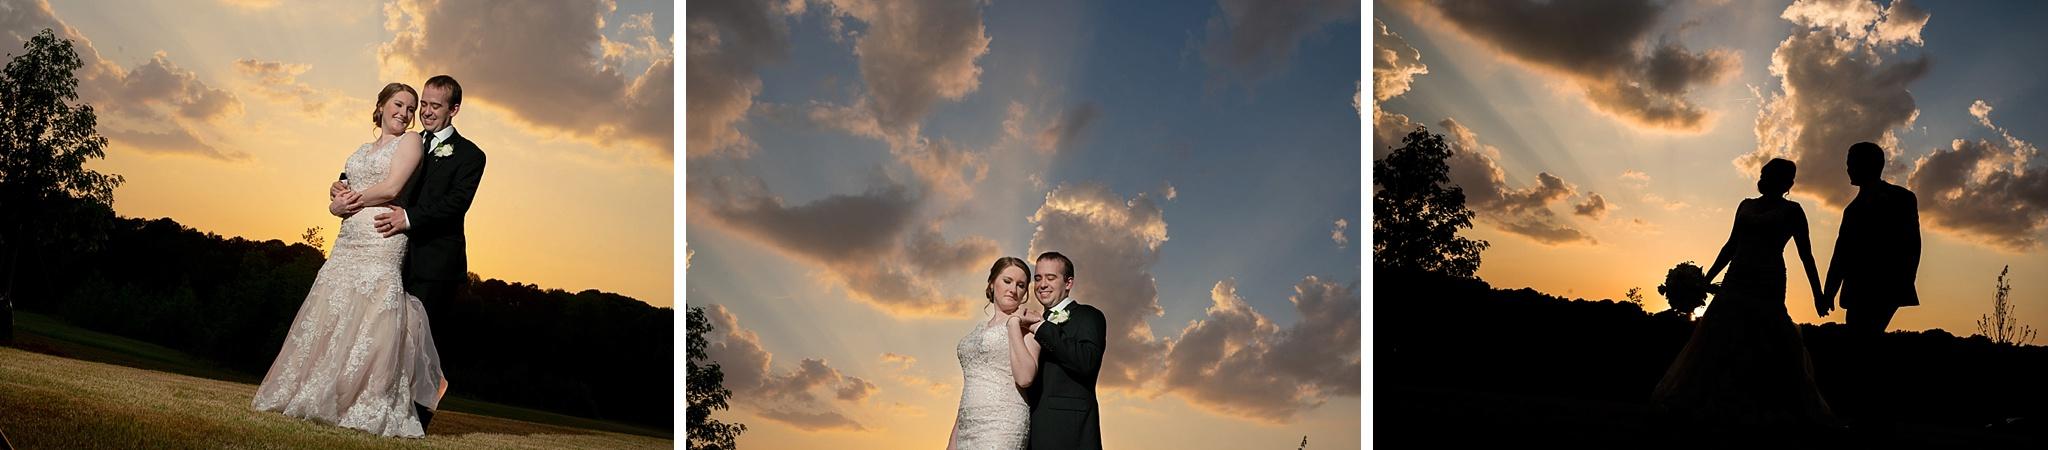 Pavilion-Carriage-Farms-Wedding-Photographer-229.jpg